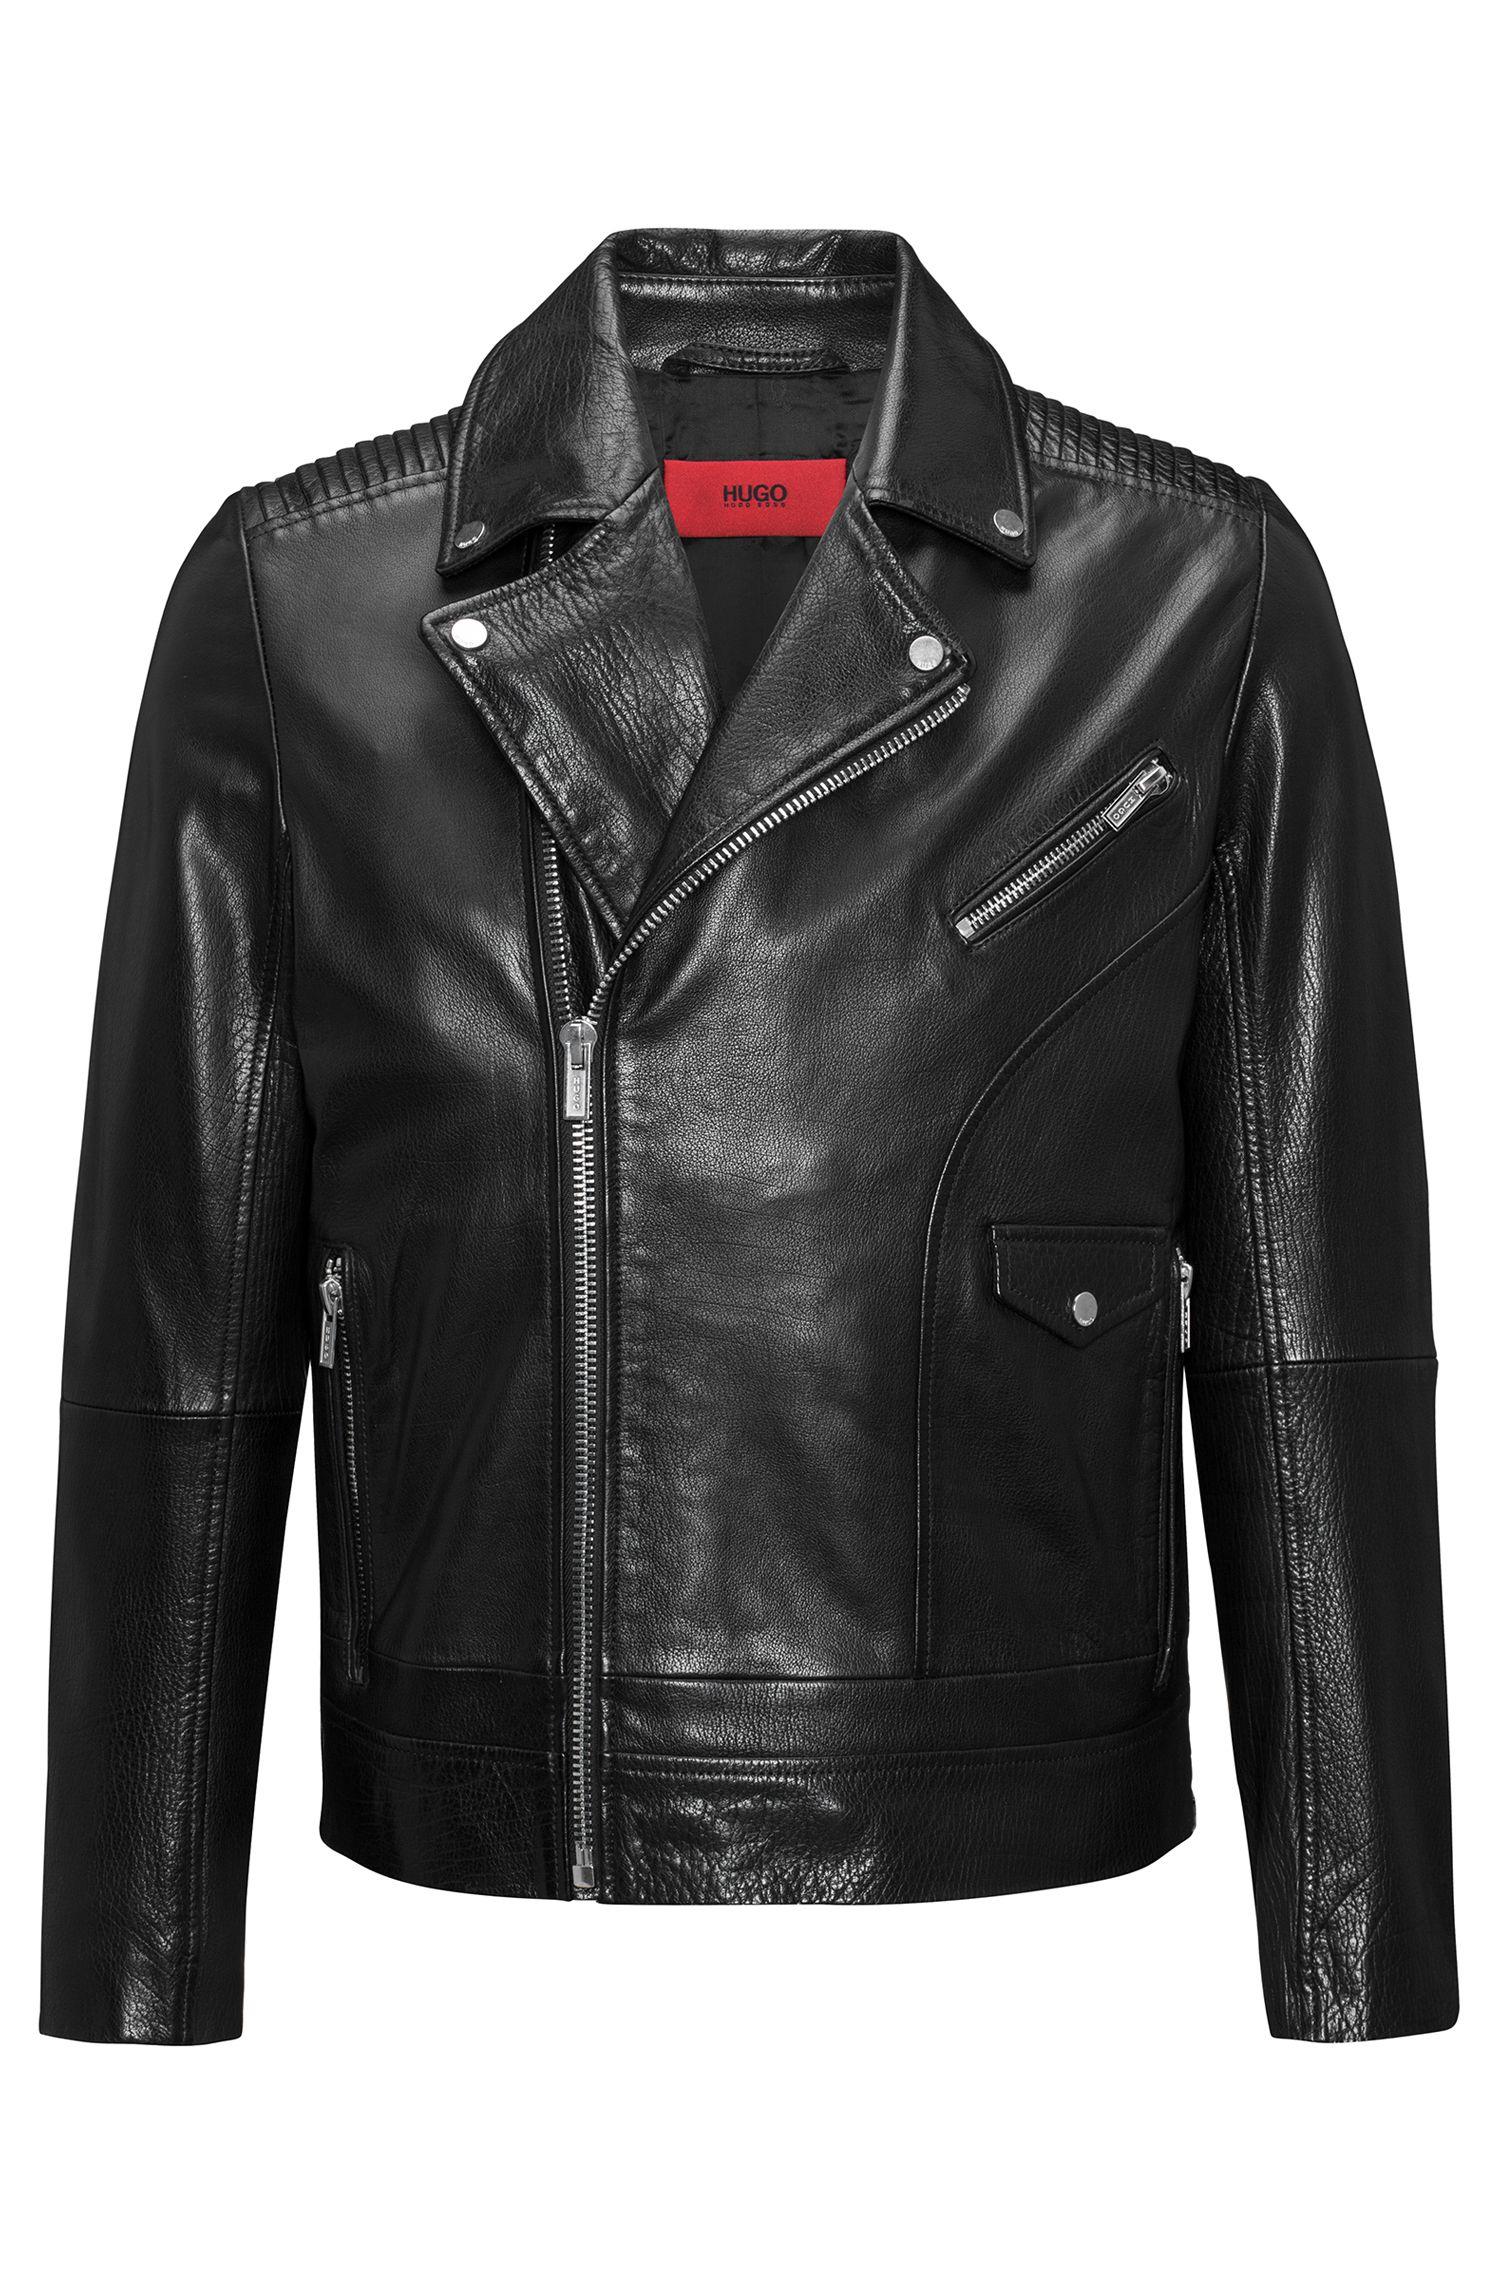 Asymmetric biker jacket in buffalo nappa leather with graffiti print